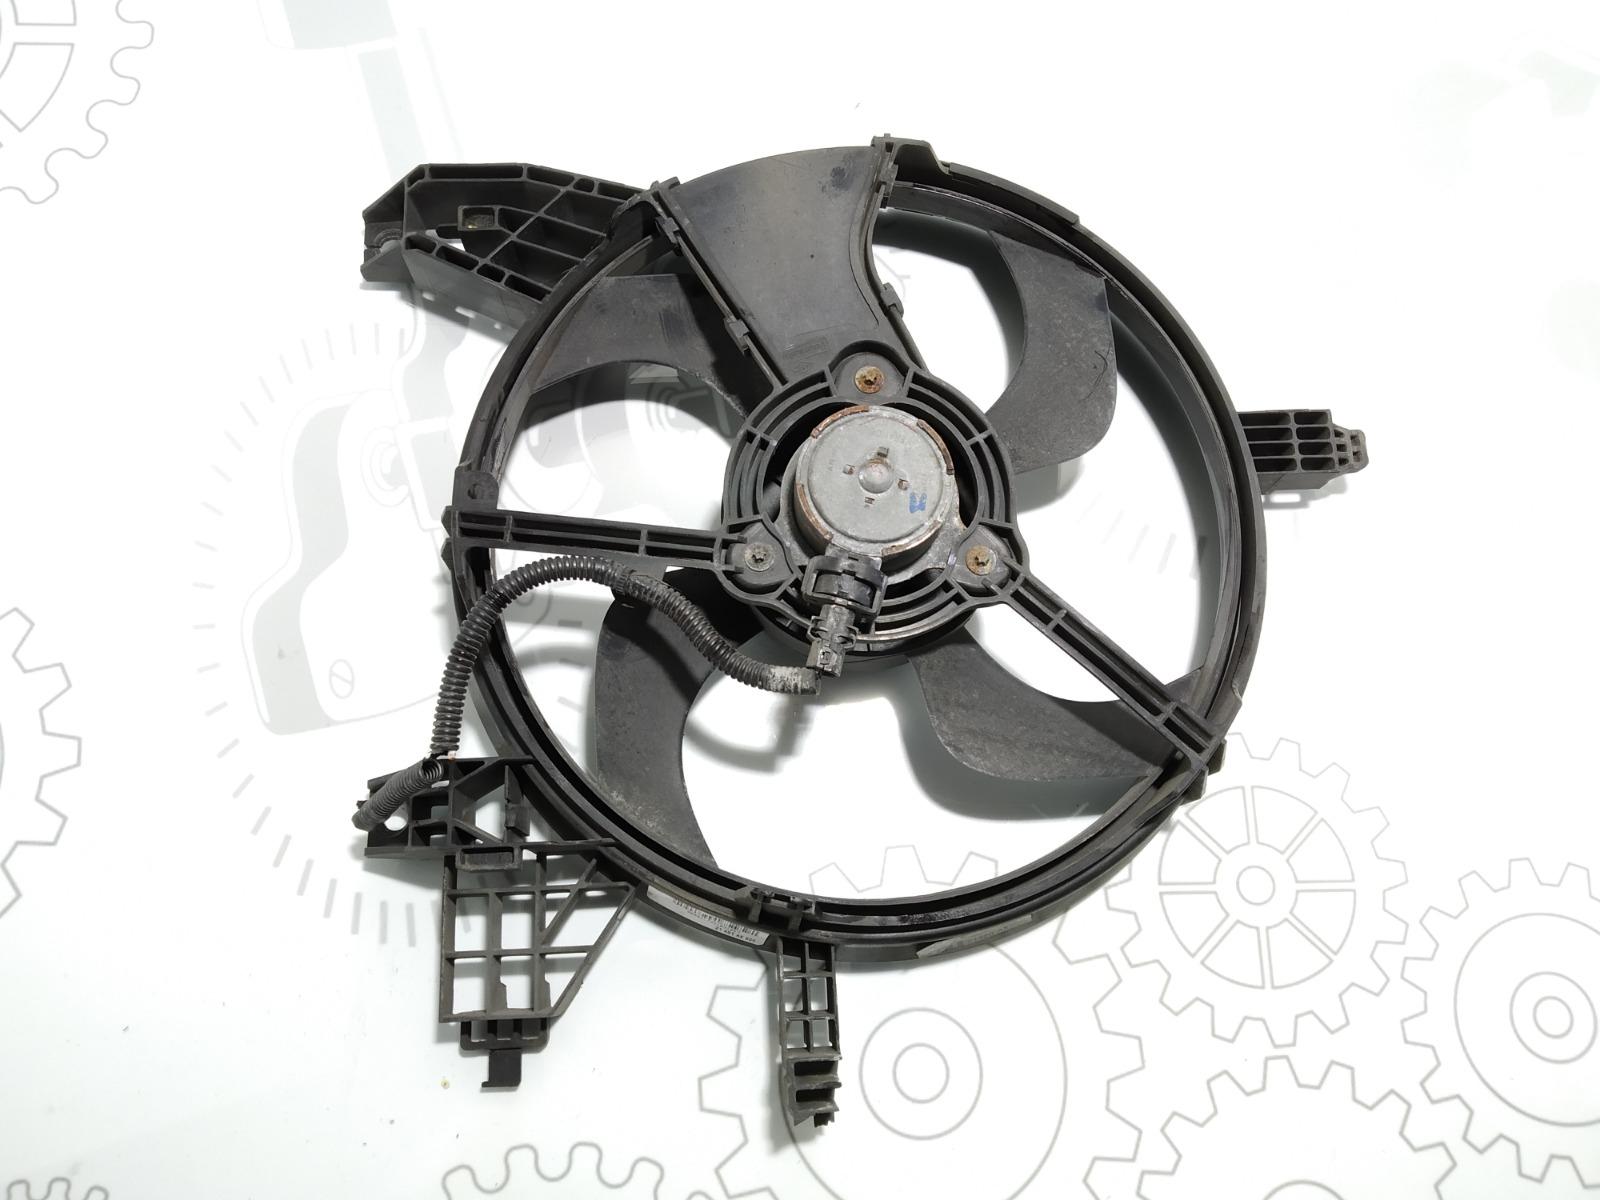 Вентилятор радиатора Nissan Micra K12 1.0 I 2003 (б/у)